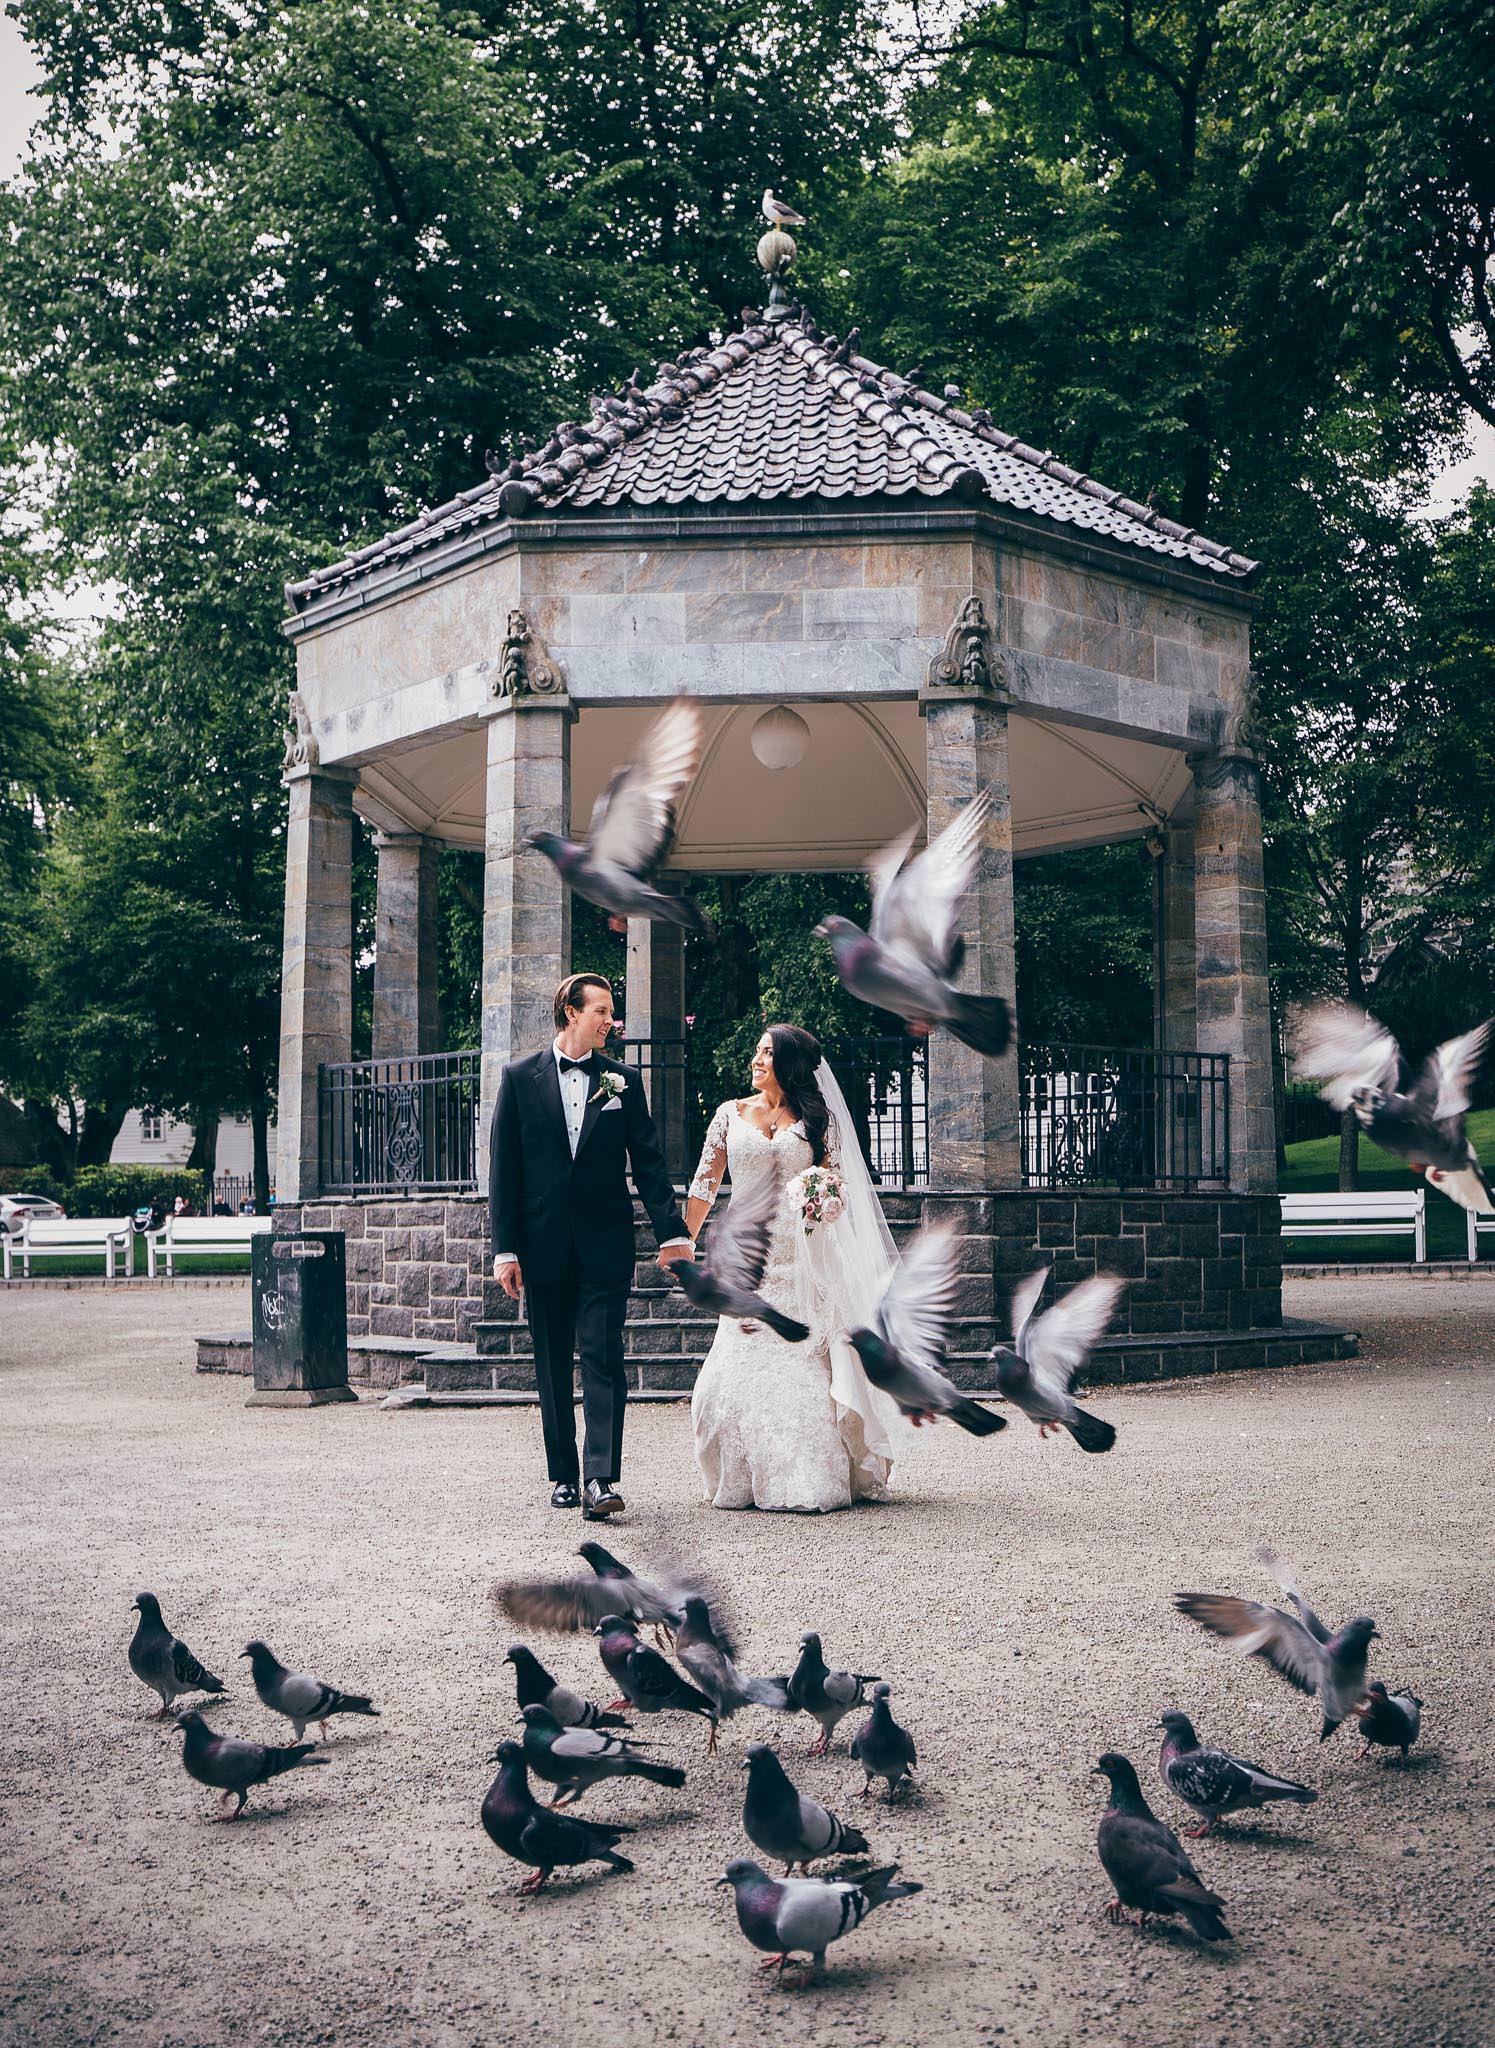 Wedding+Photographer+Norway+Bryllupsfotograf+Casey+Arneson+MK-151.jpg